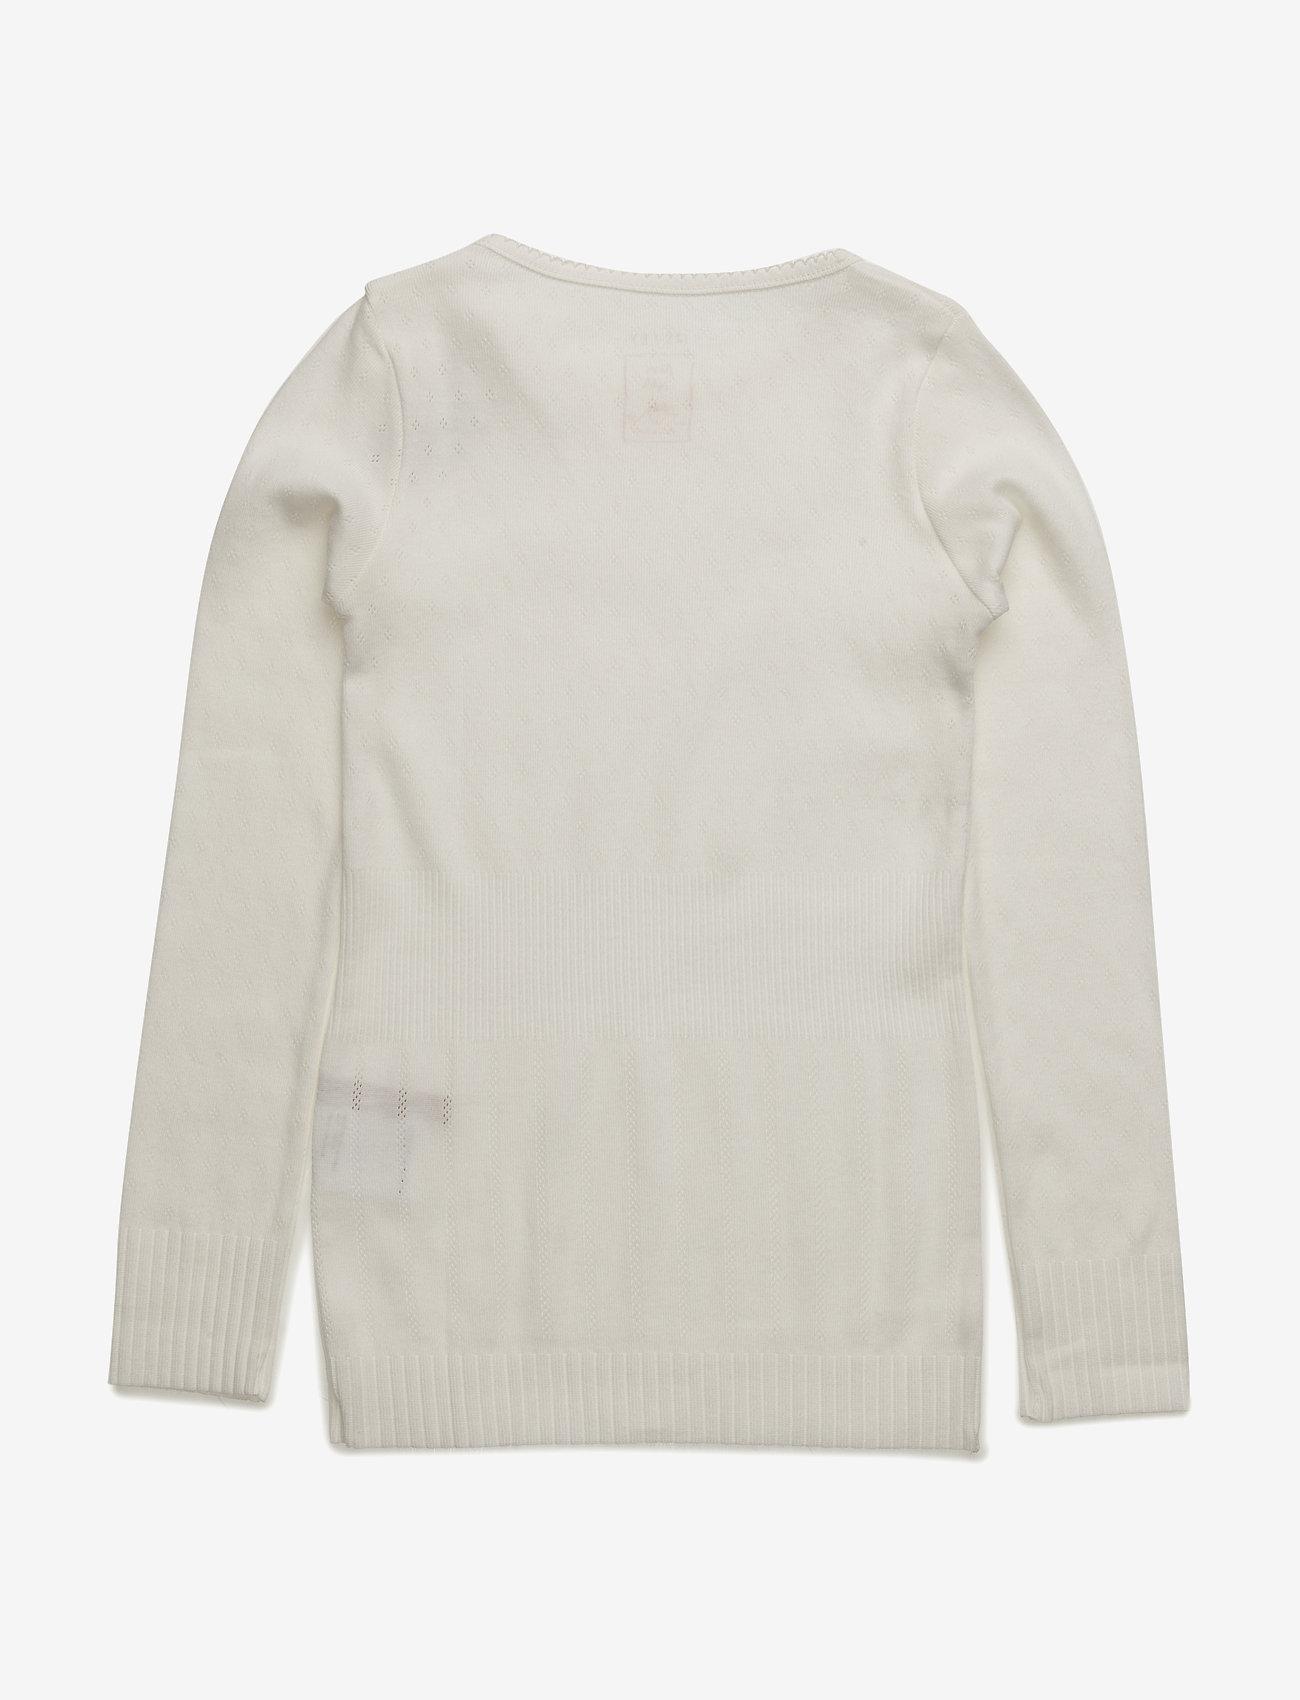 Noa Noa Miniature - T-shirt - long-sleeved t-shirts - chalk - 1